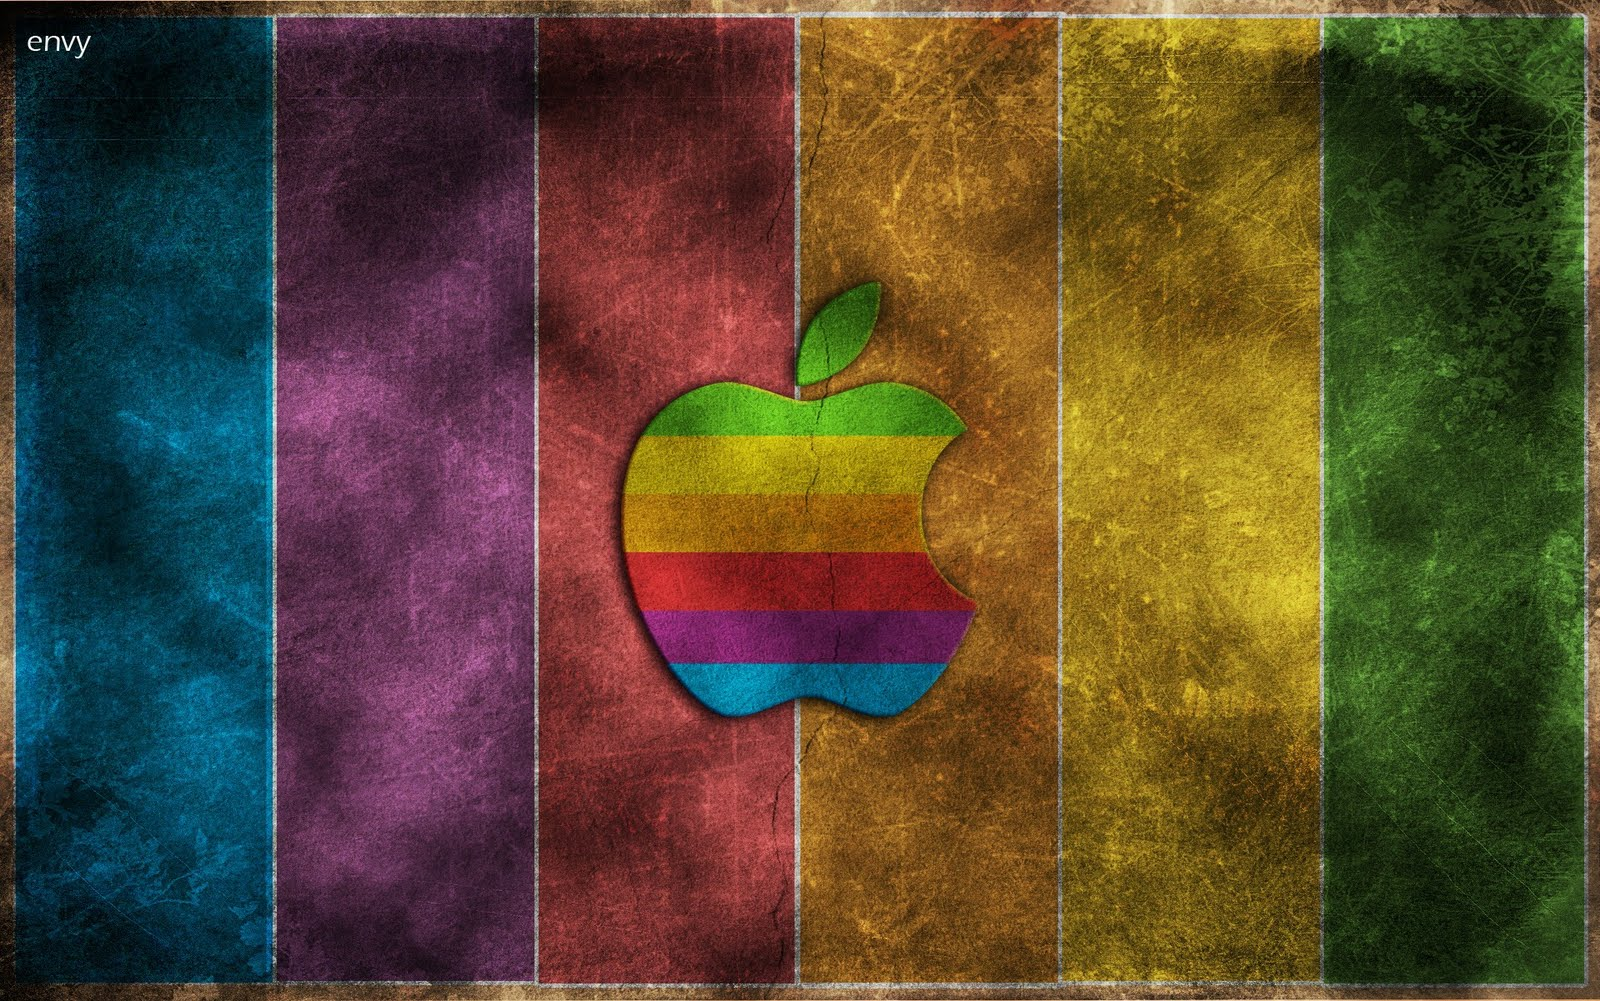 http://2.bp.blogspot.com/-p_U7GDbTpXU/Tm9-lKMEfwI/AAAAAAAAASE/PESWssXqfcs/s1600/apple3.jpg